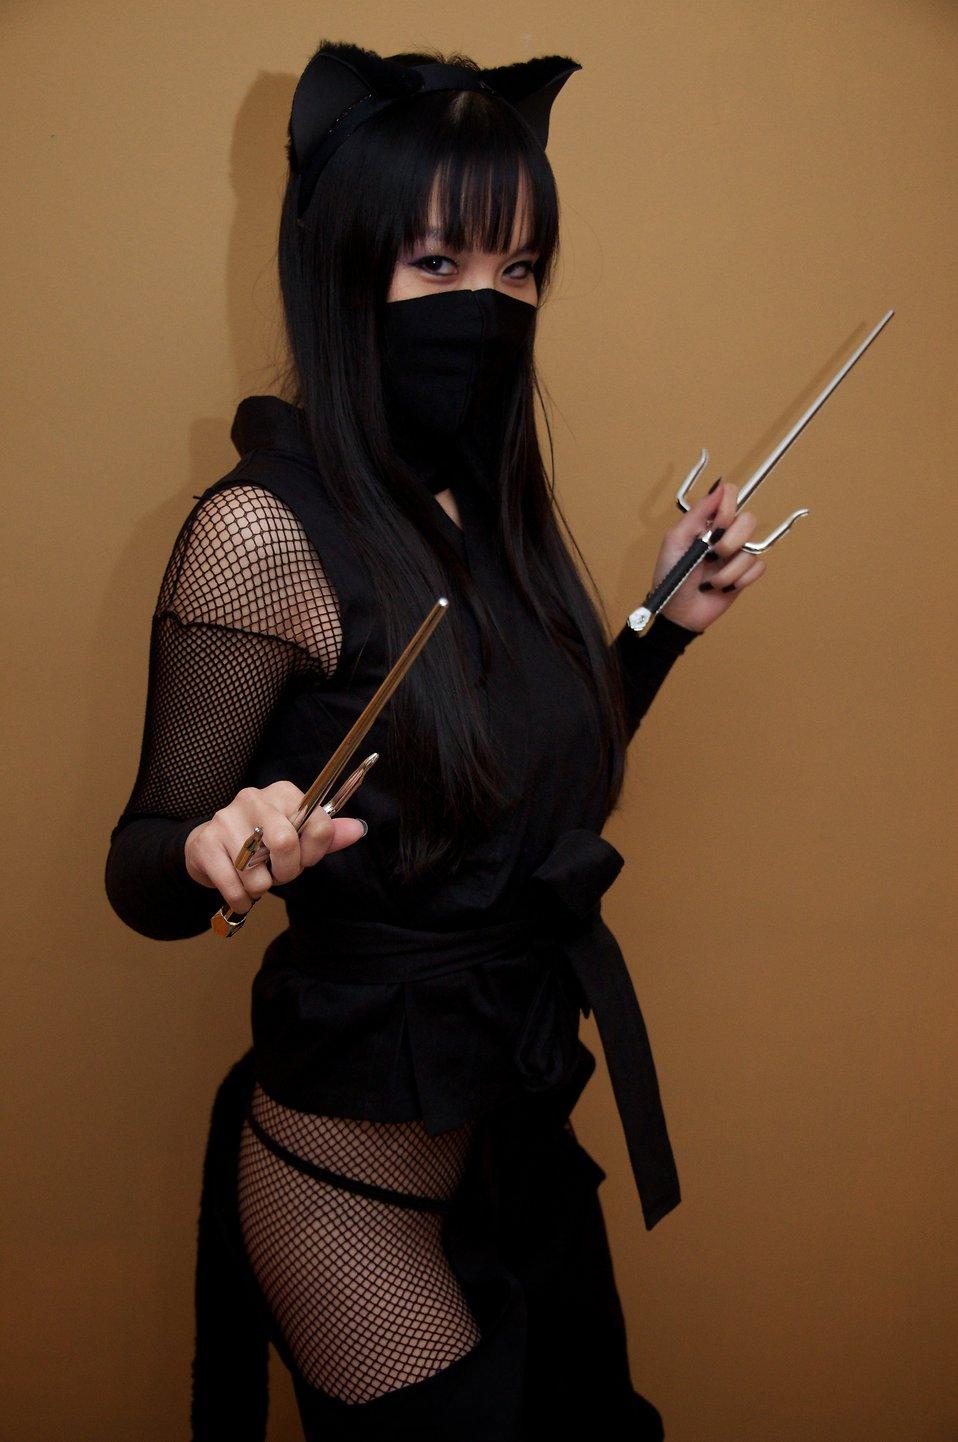 ninja-cat-girl